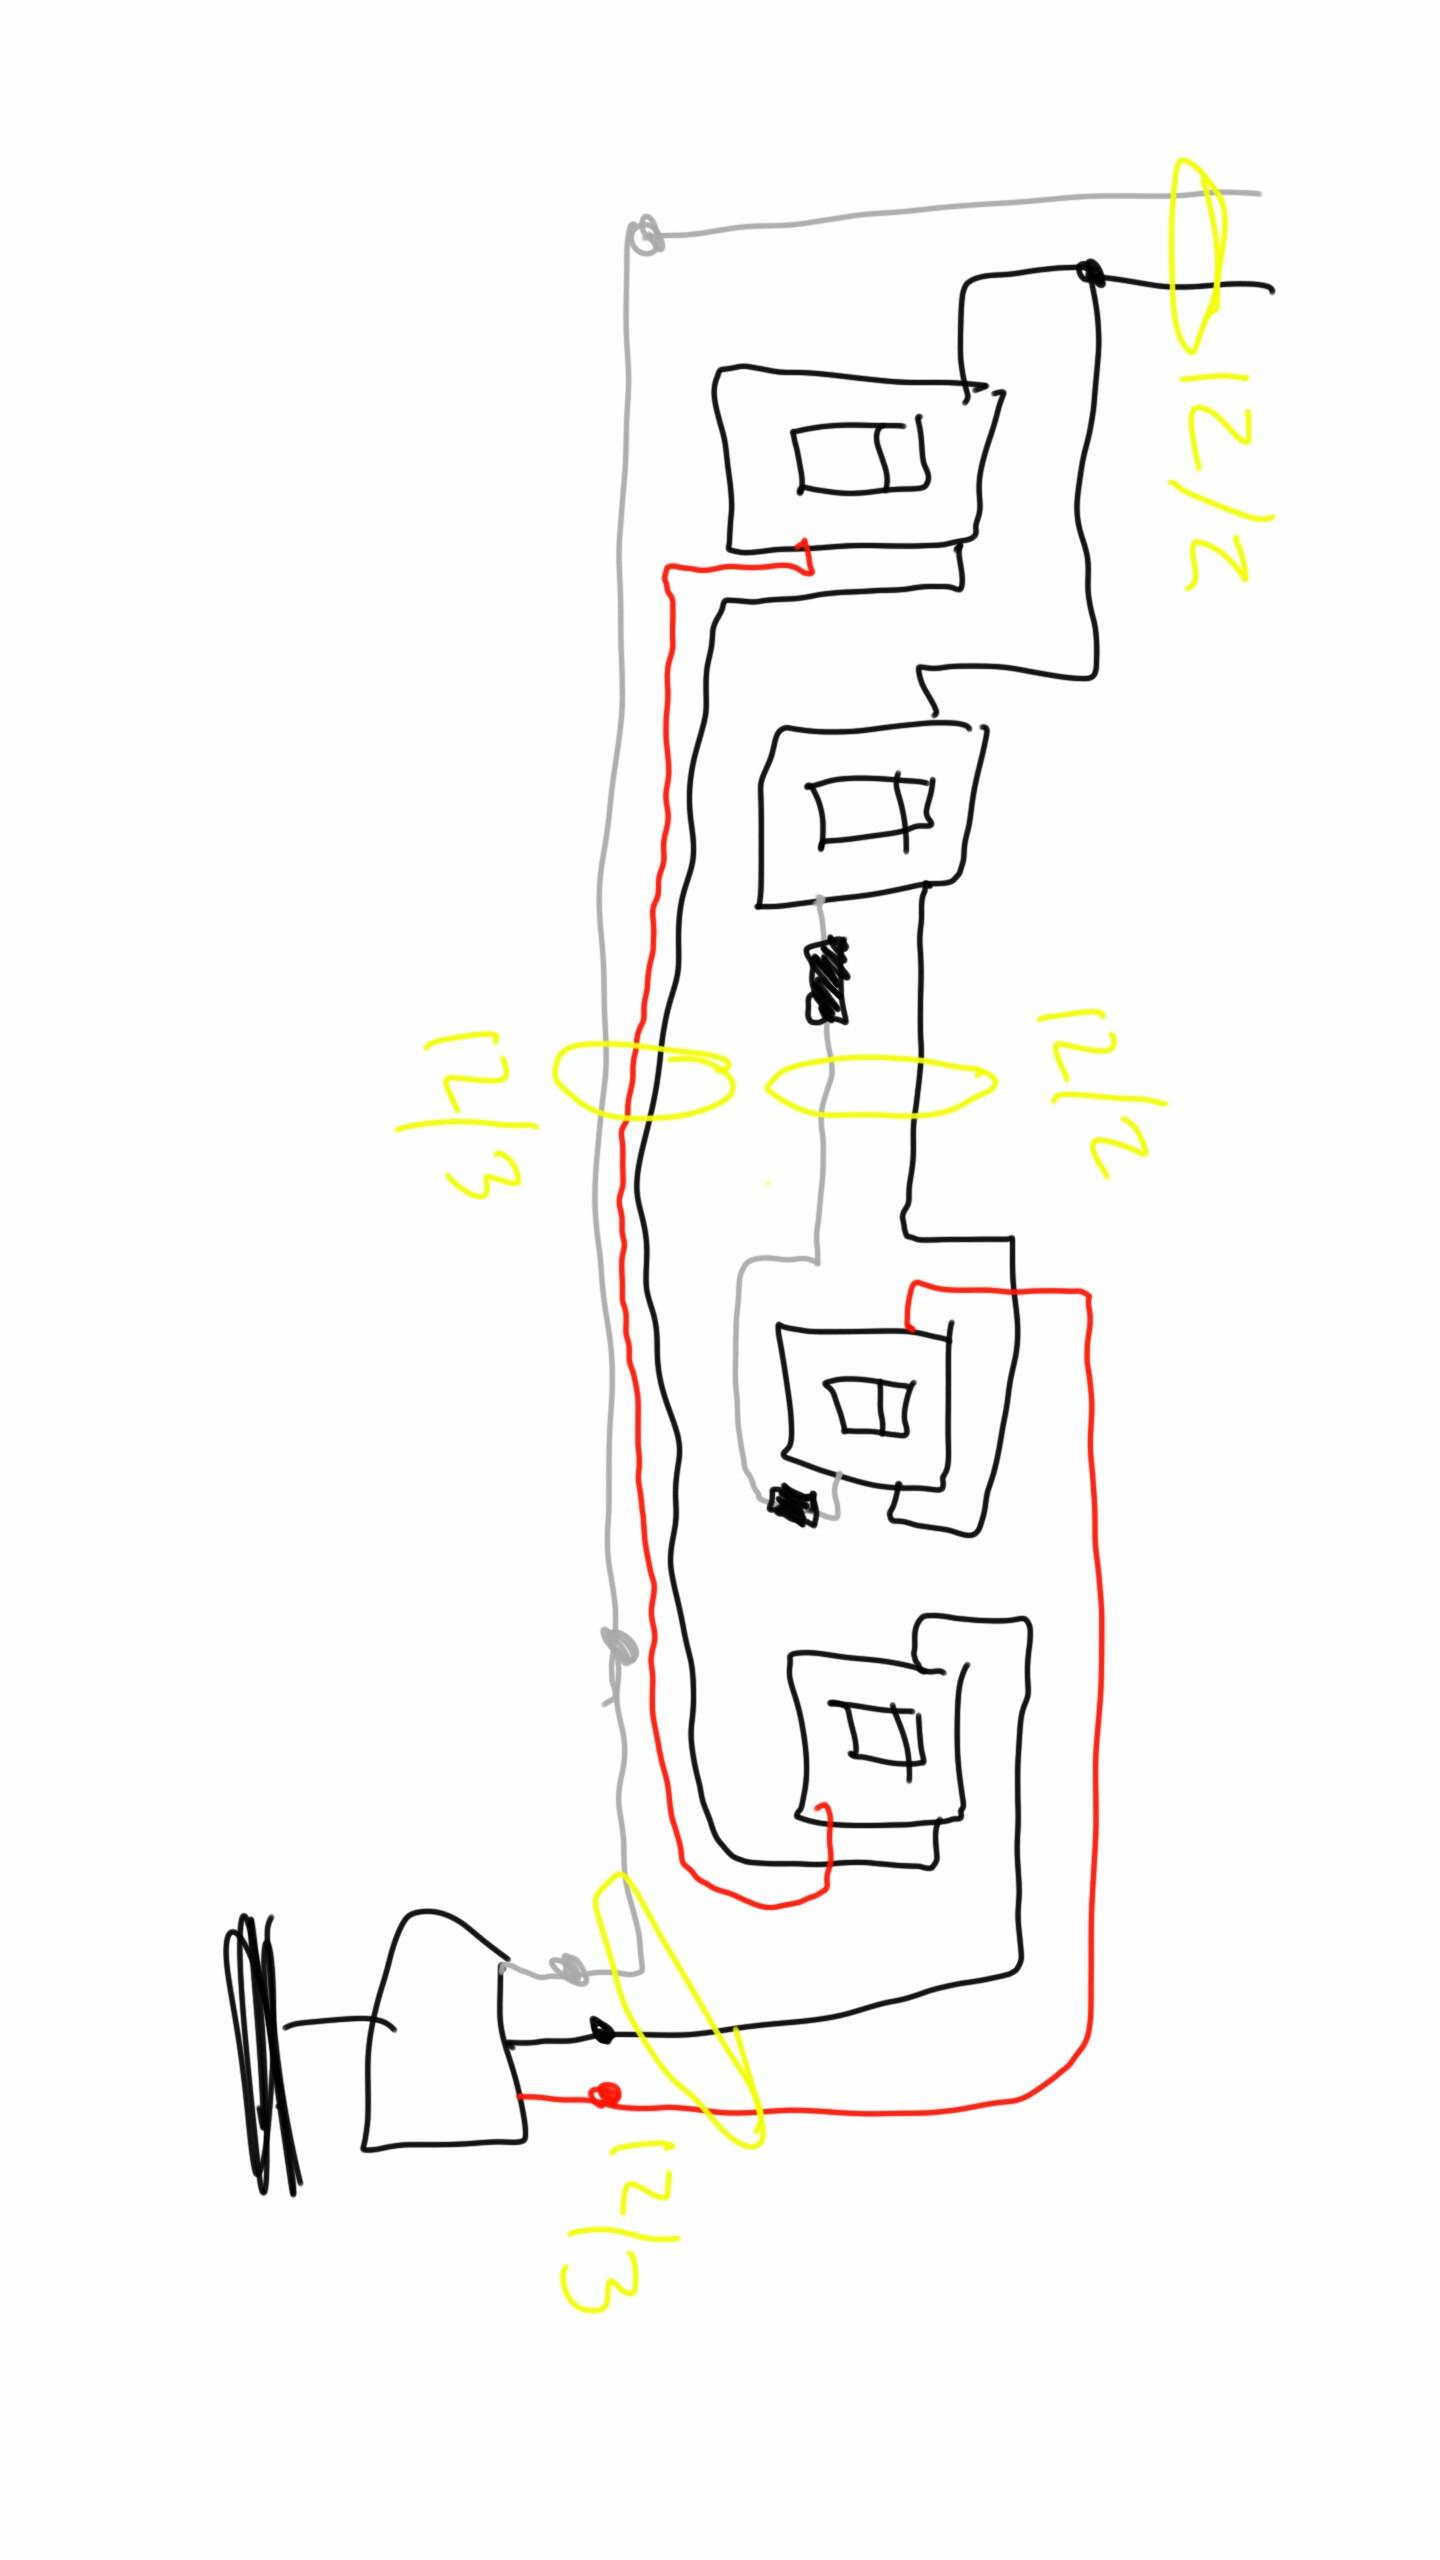 dual switch wiring diagram ceiling fan cs 7718  install 3 way fan switch  cs 7718  install 3 way fan switch